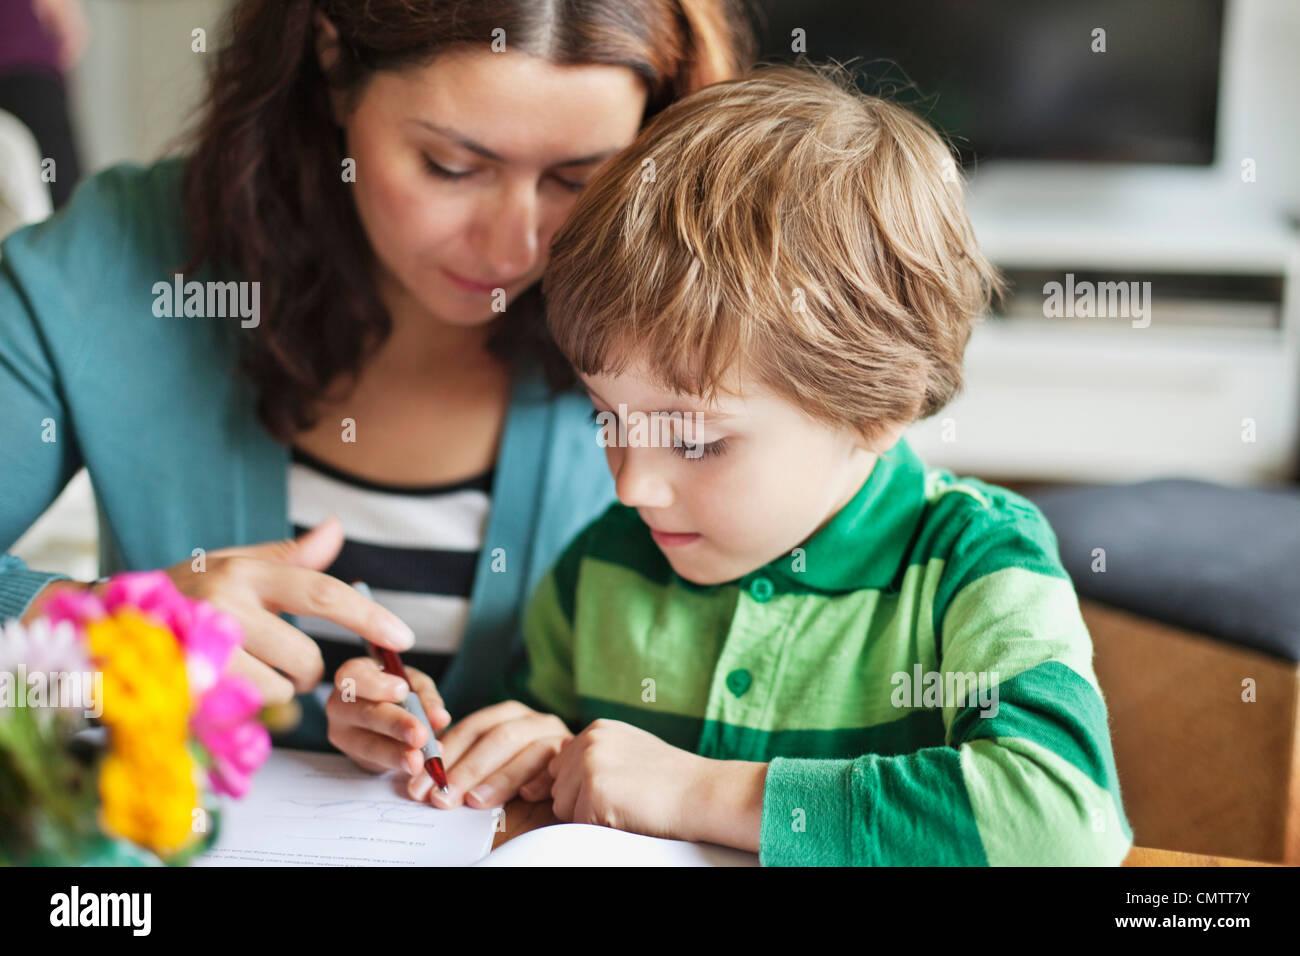 Madre e hijo (6-7) el dibujo Imagen De Stock